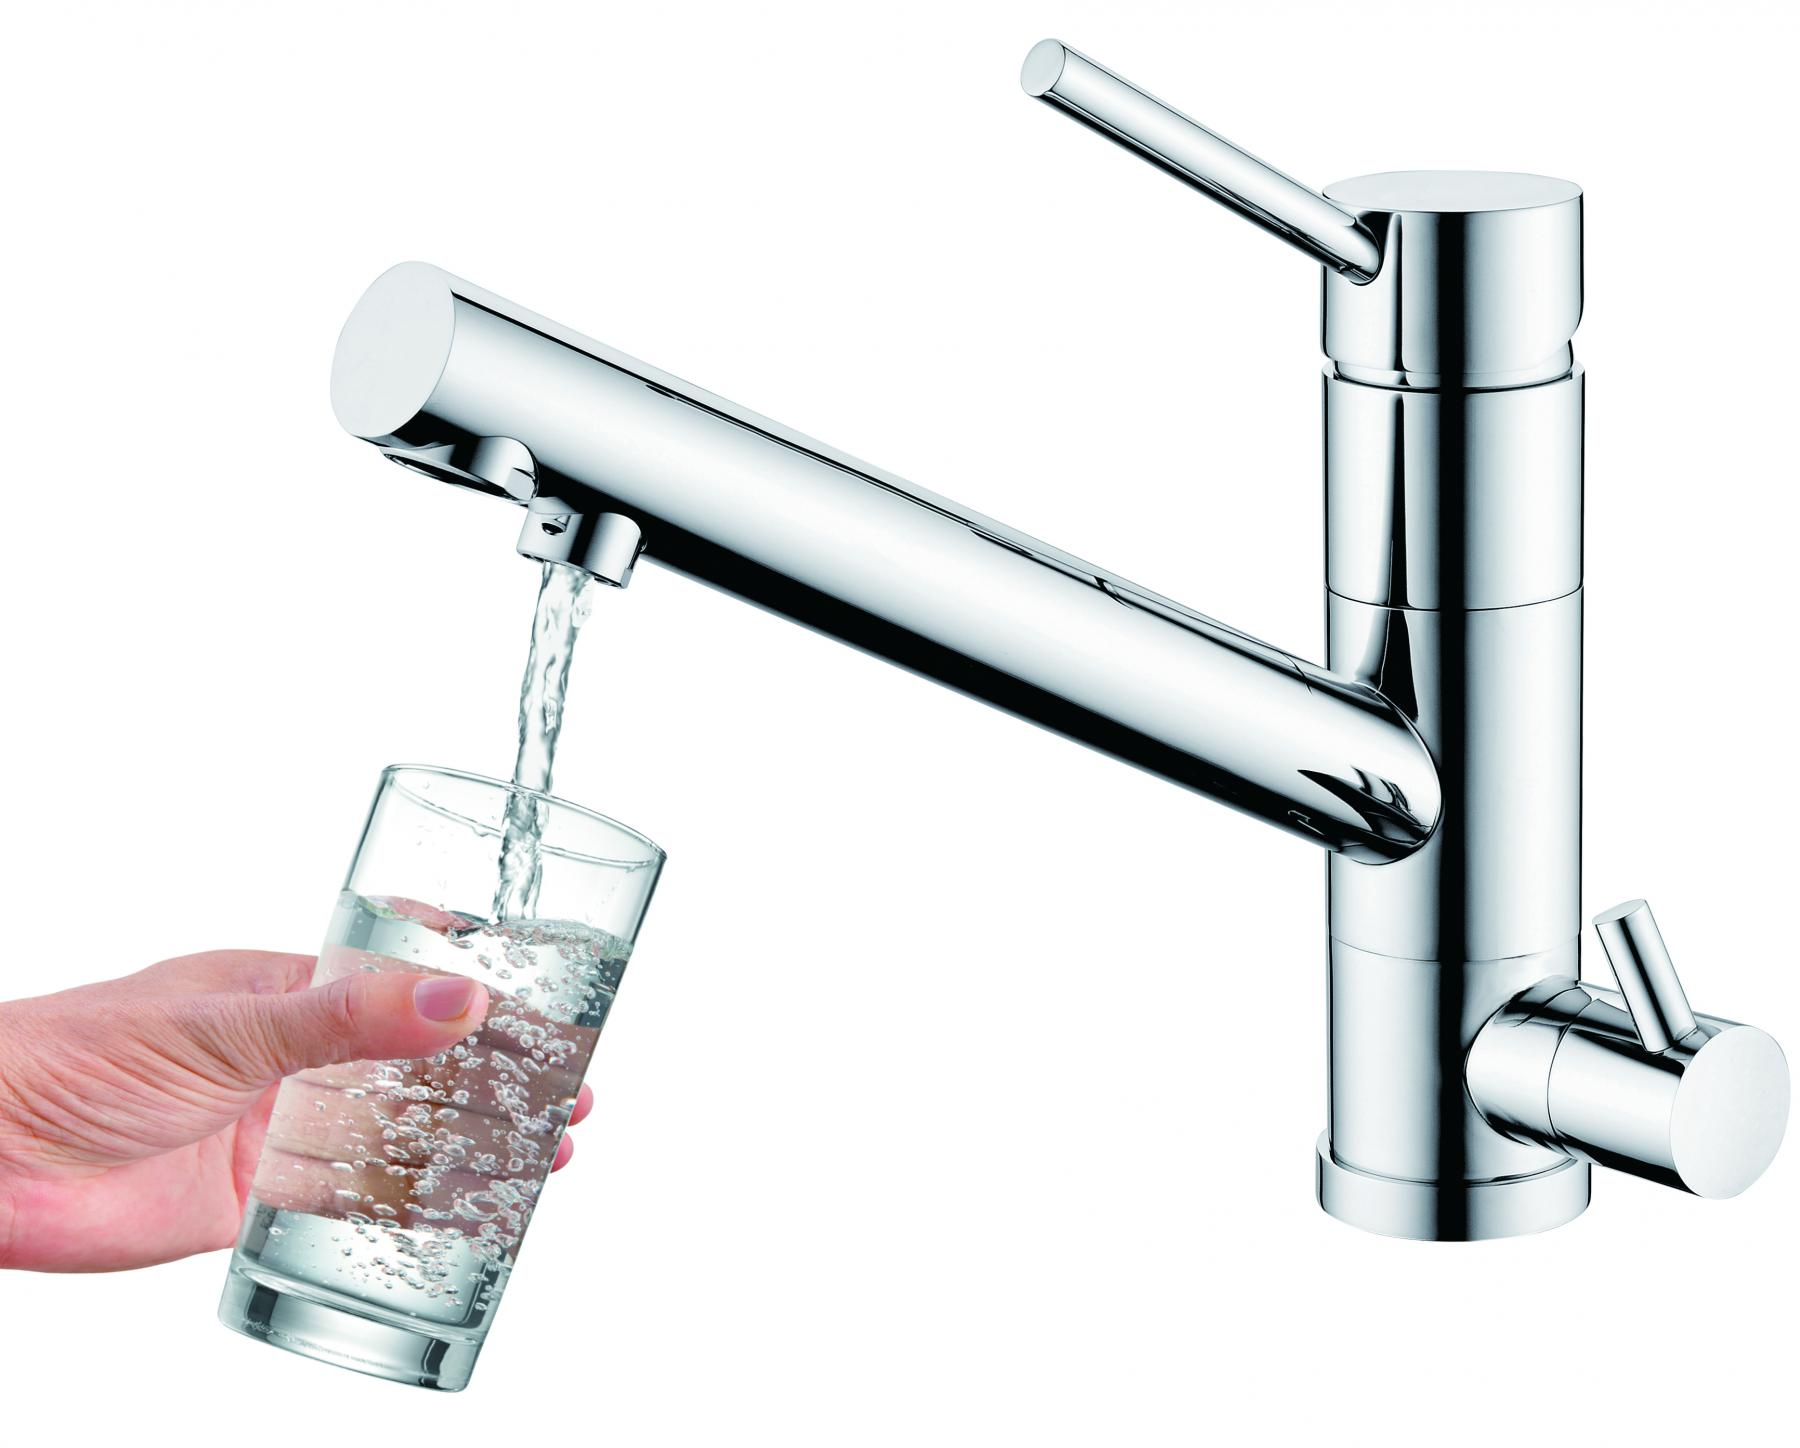 Küchenarmatur Umkehr Osmose, Filter, Trinkwasser, Trinkwasserfilter, 16 wege  Küchenmischer, Spültischarmatur, Spülenmischer, Wasserhahn Küche,